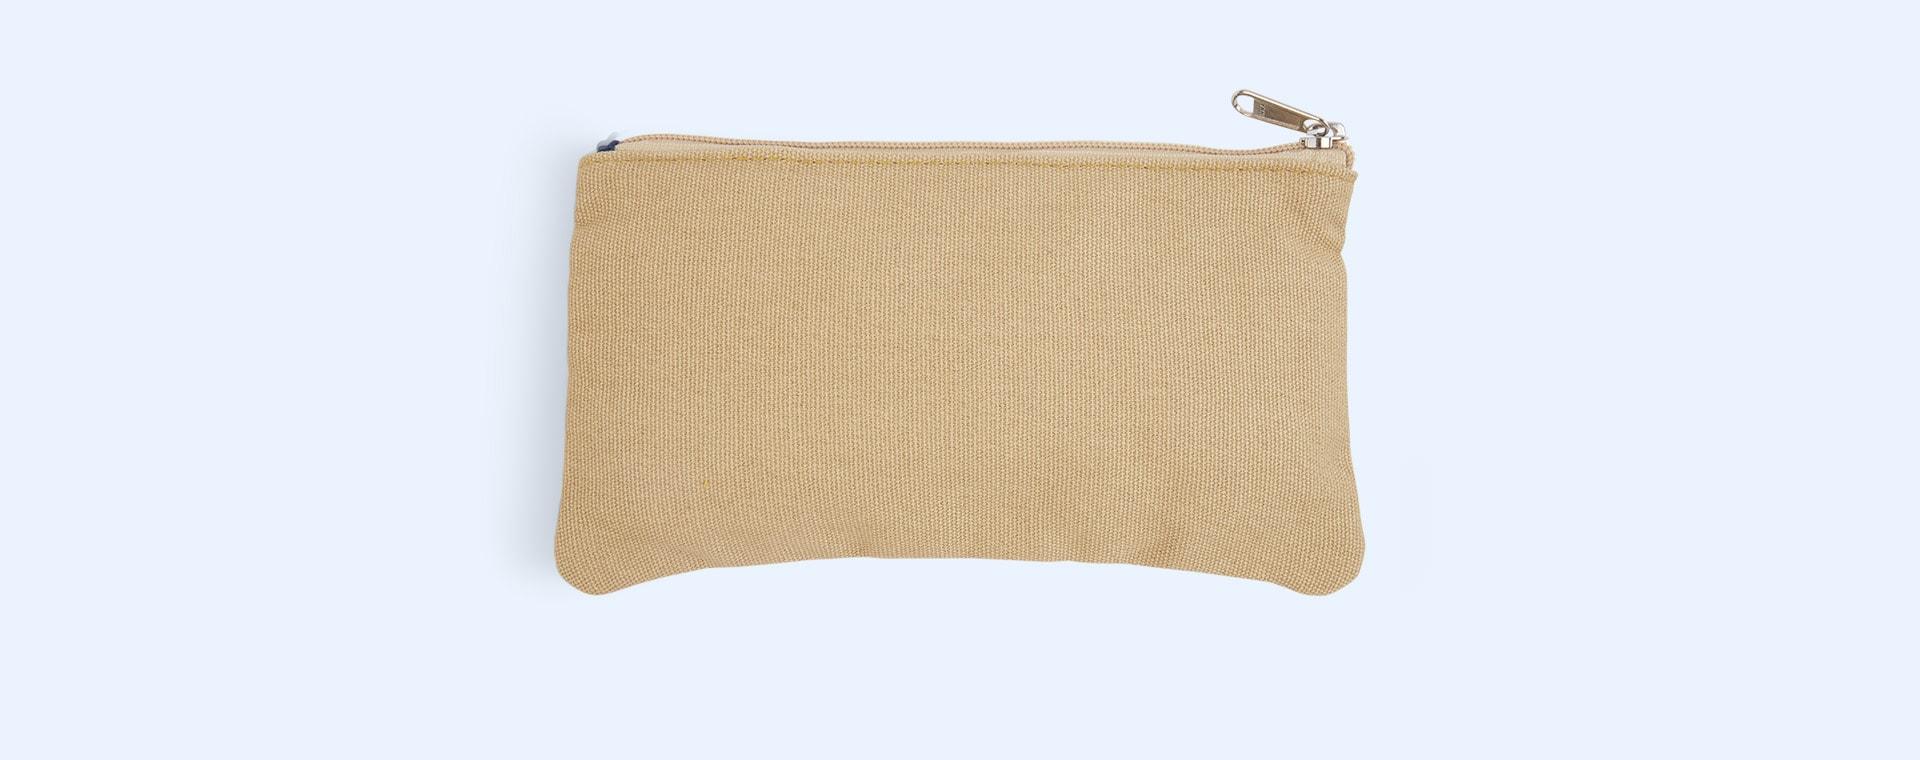 Navy & Beige Blafre Pencil Case